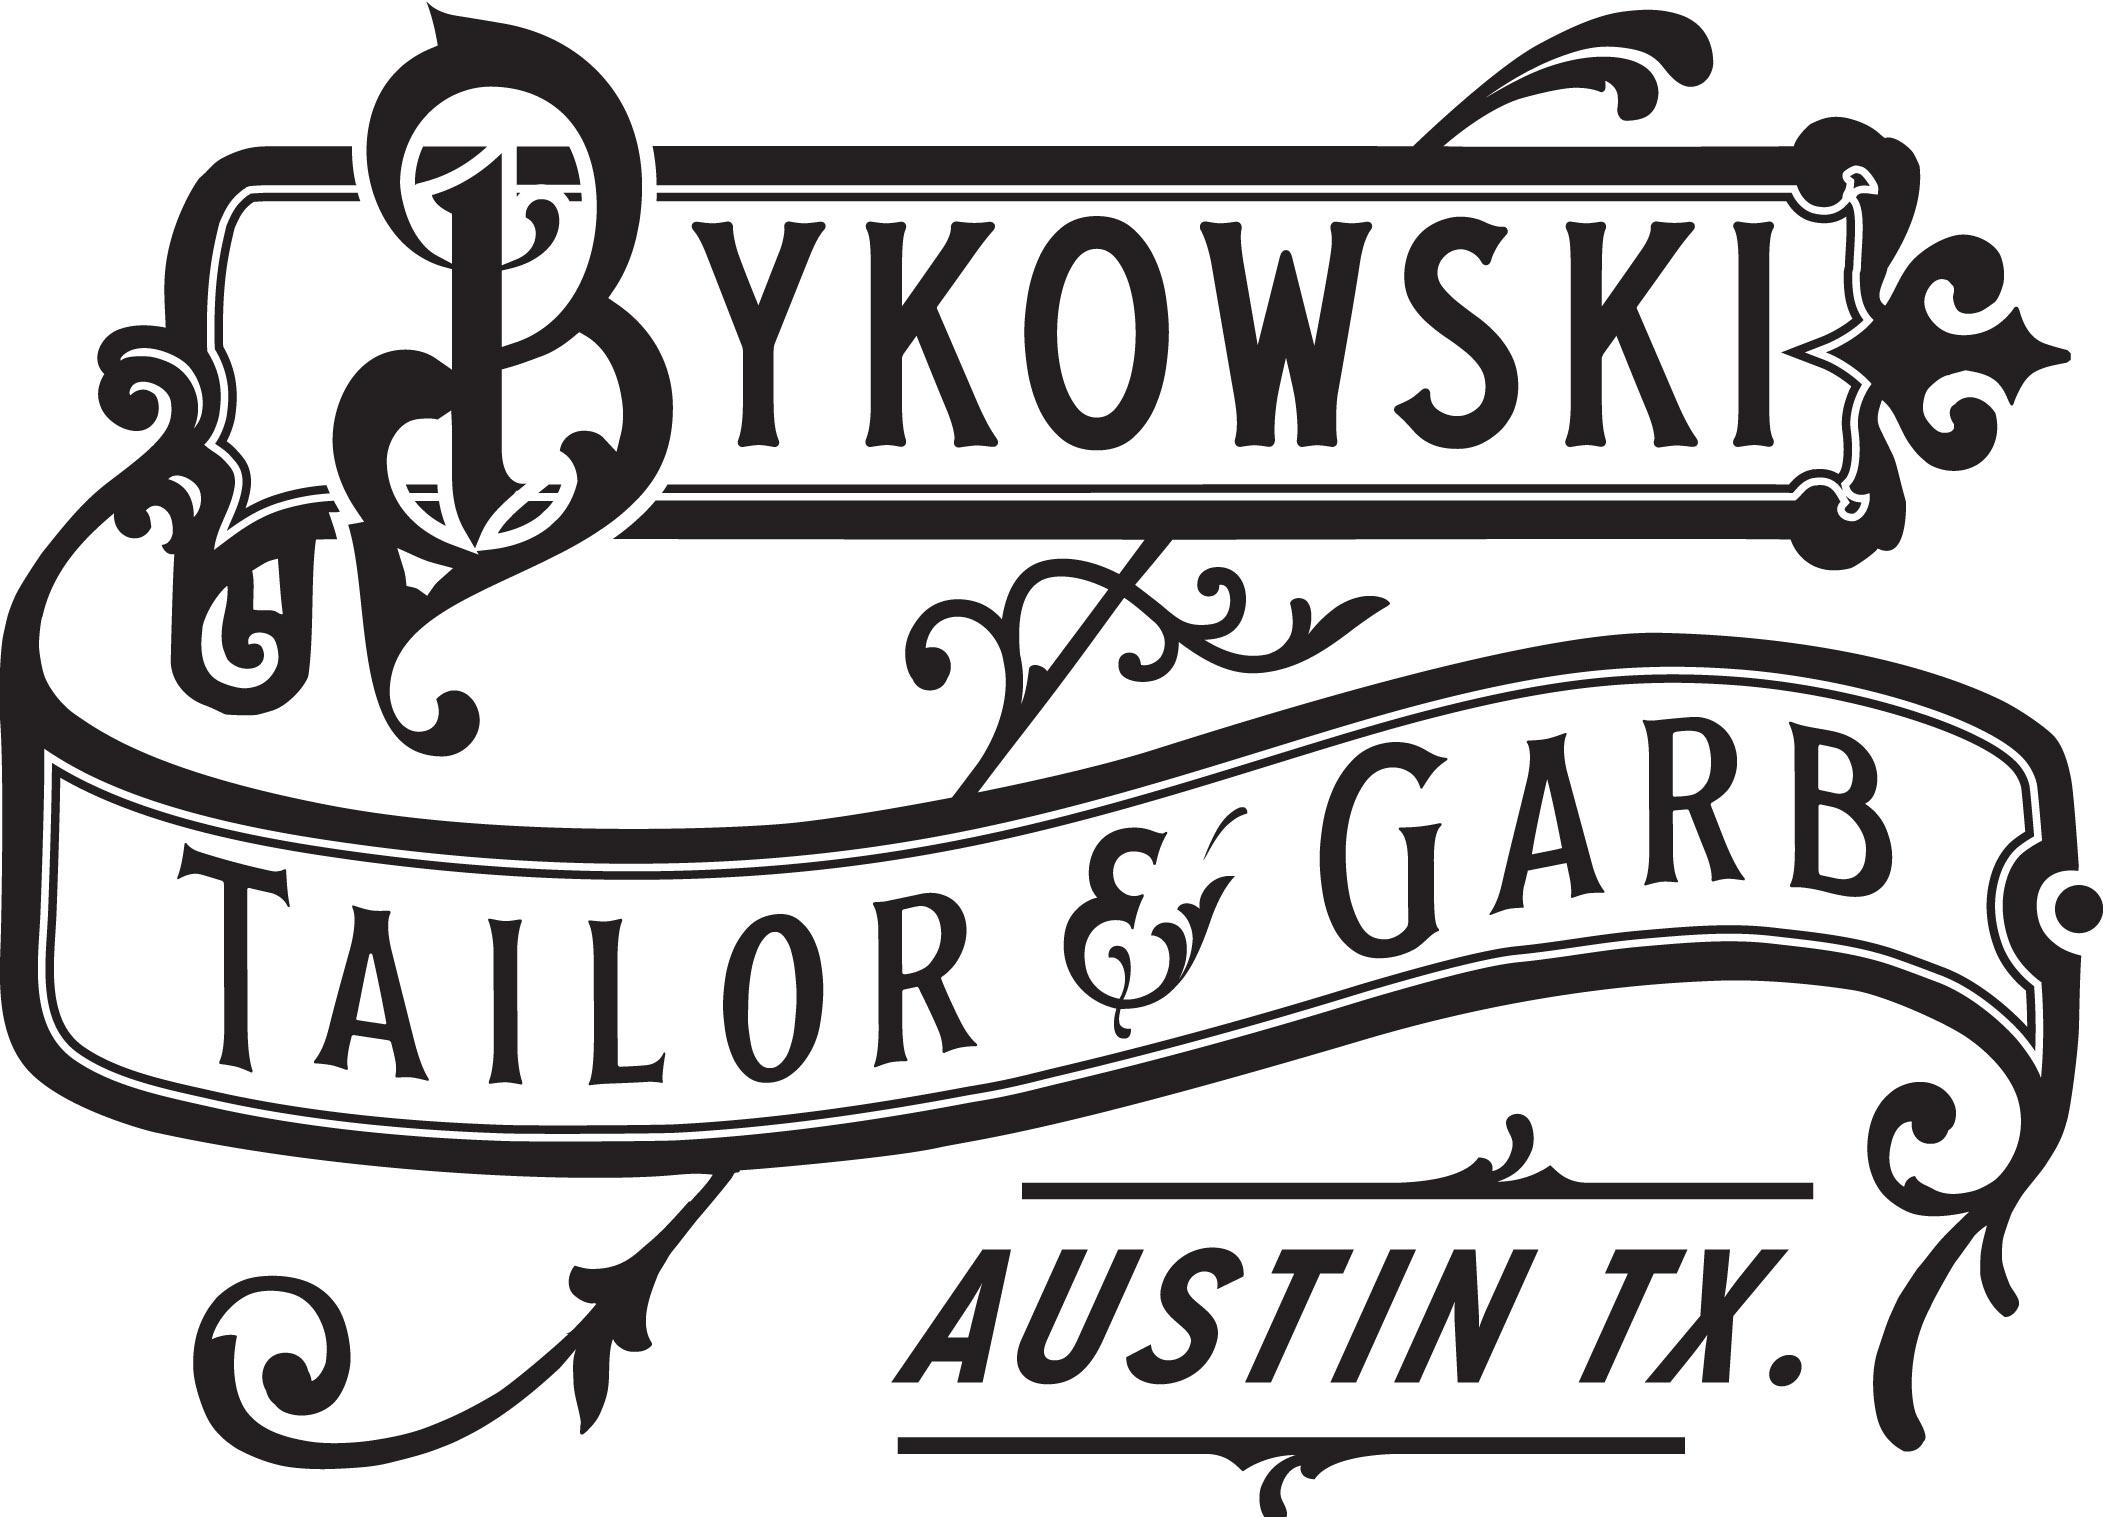 Bykowski Tailor & Garb - Austin Wedding Attire